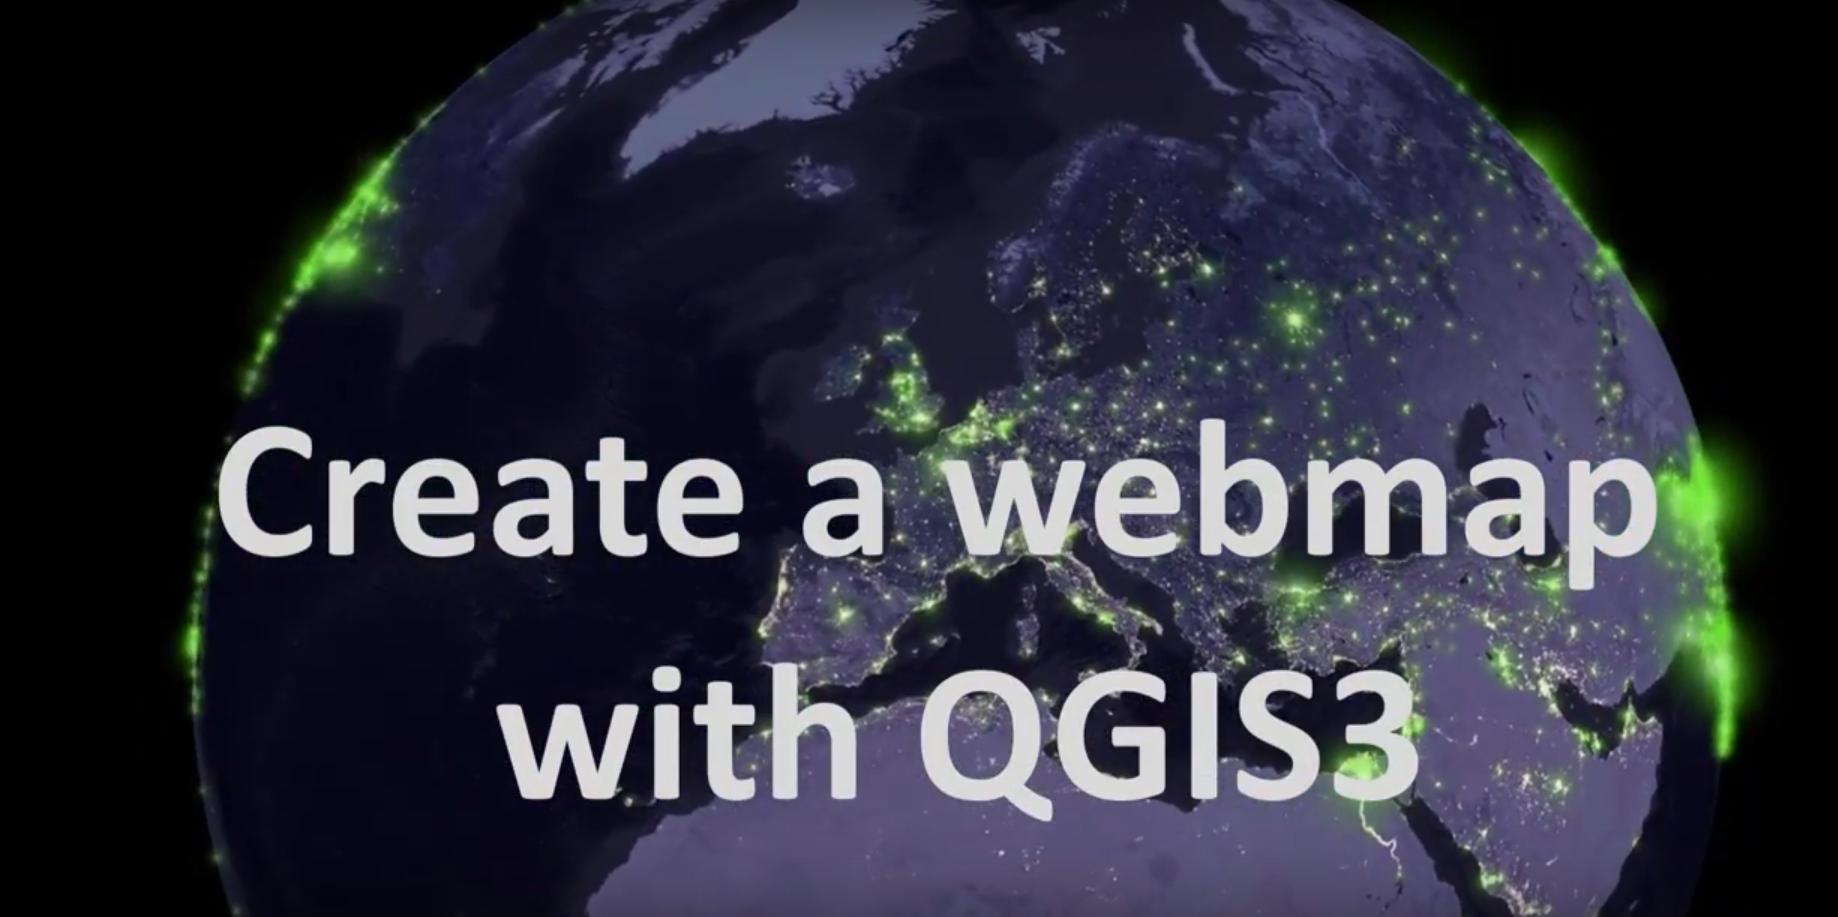 Create a webmap with QGIS